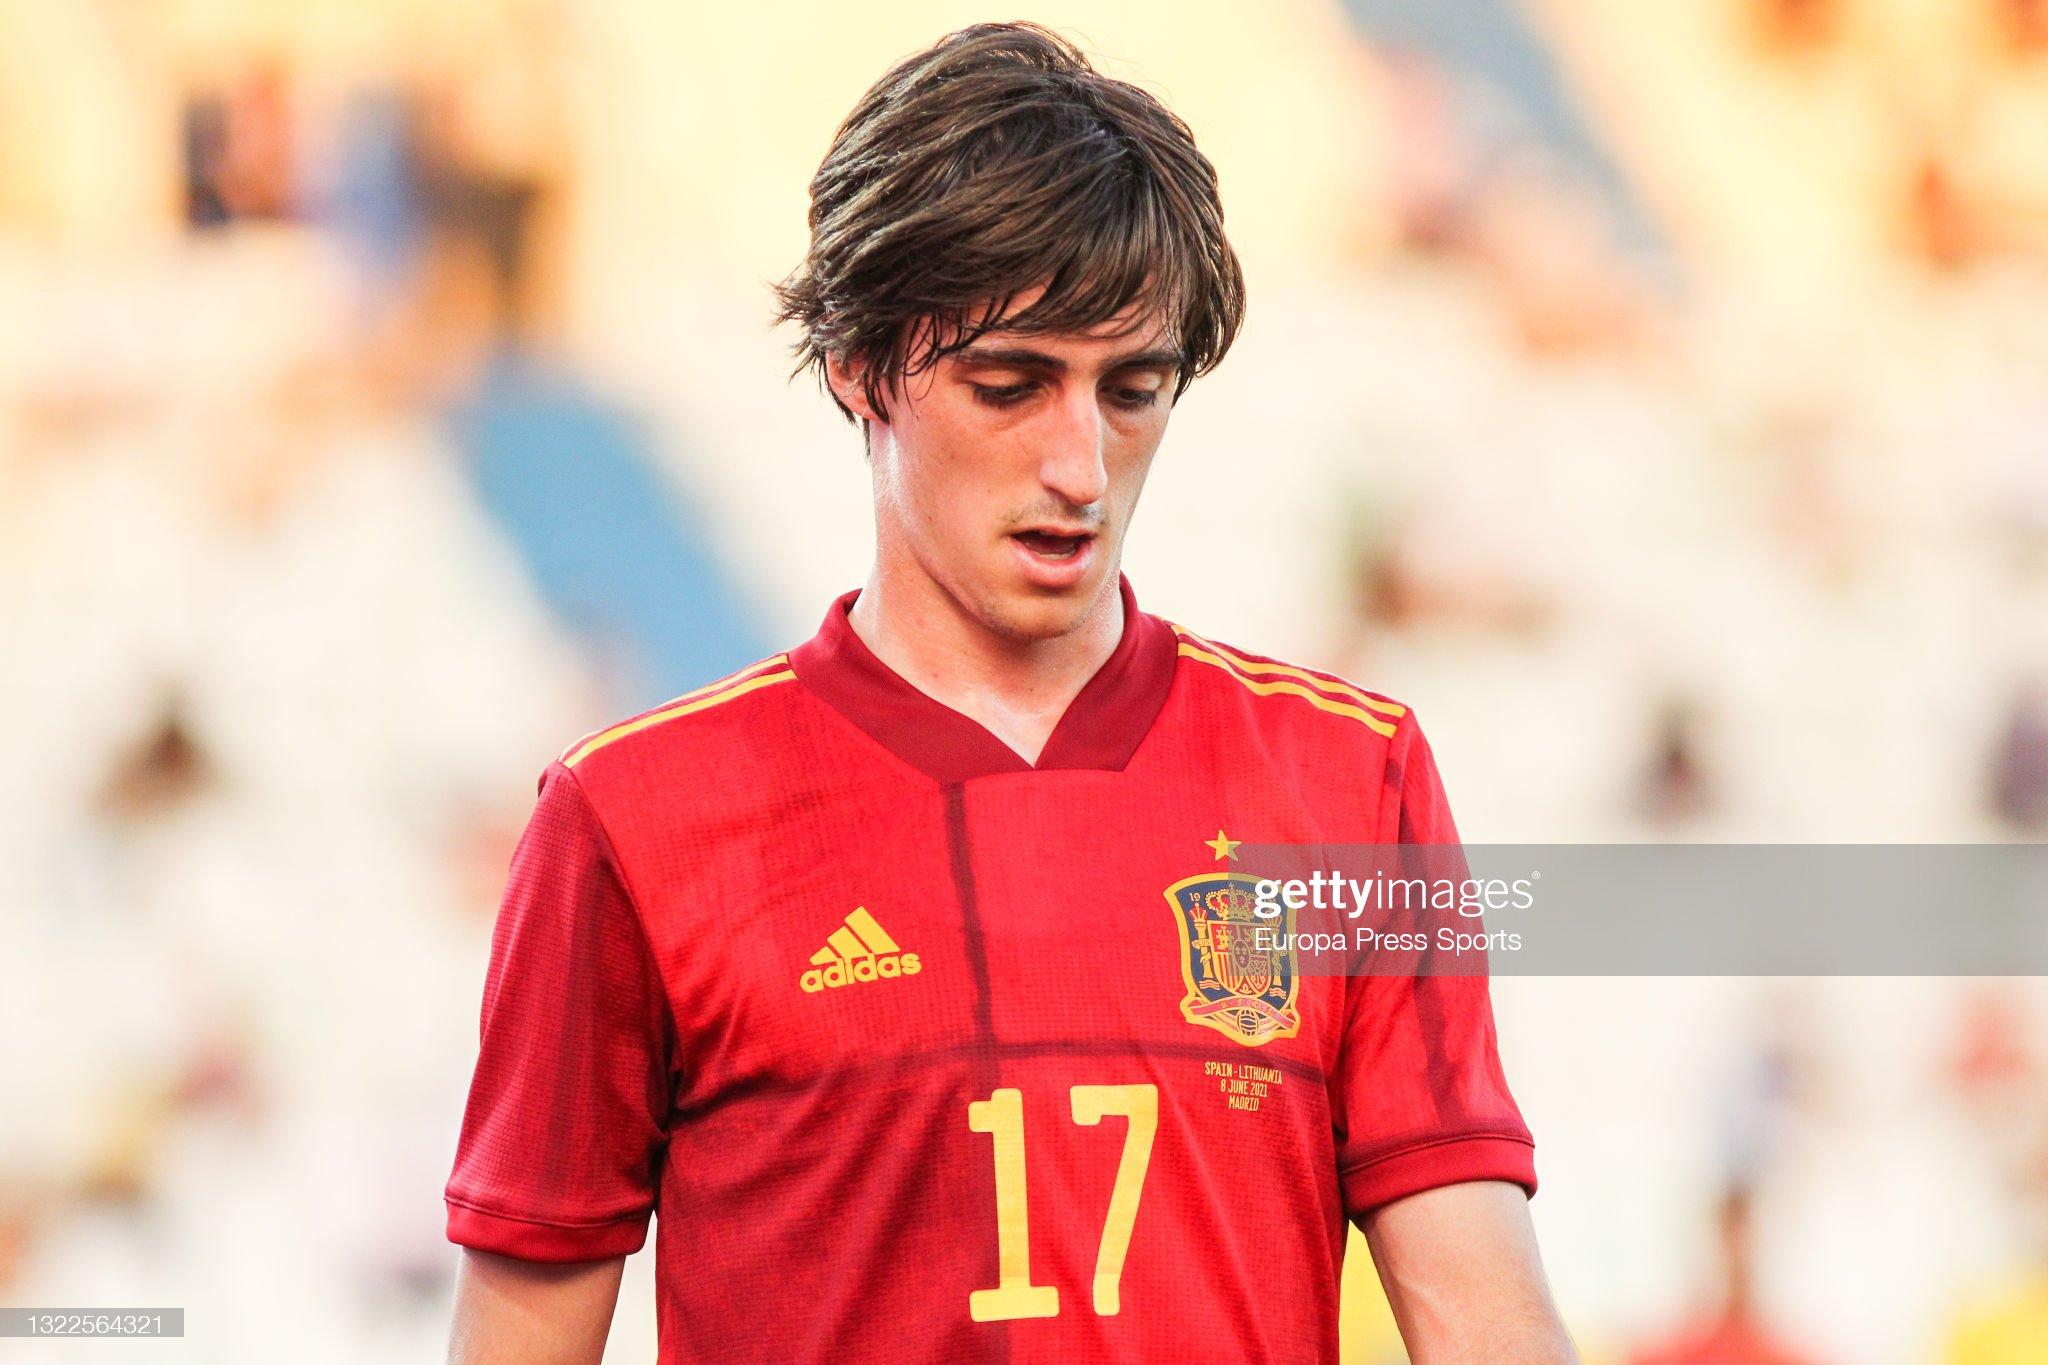 Spain U21 V Lithuania - International Friendly Match : ニュース写真